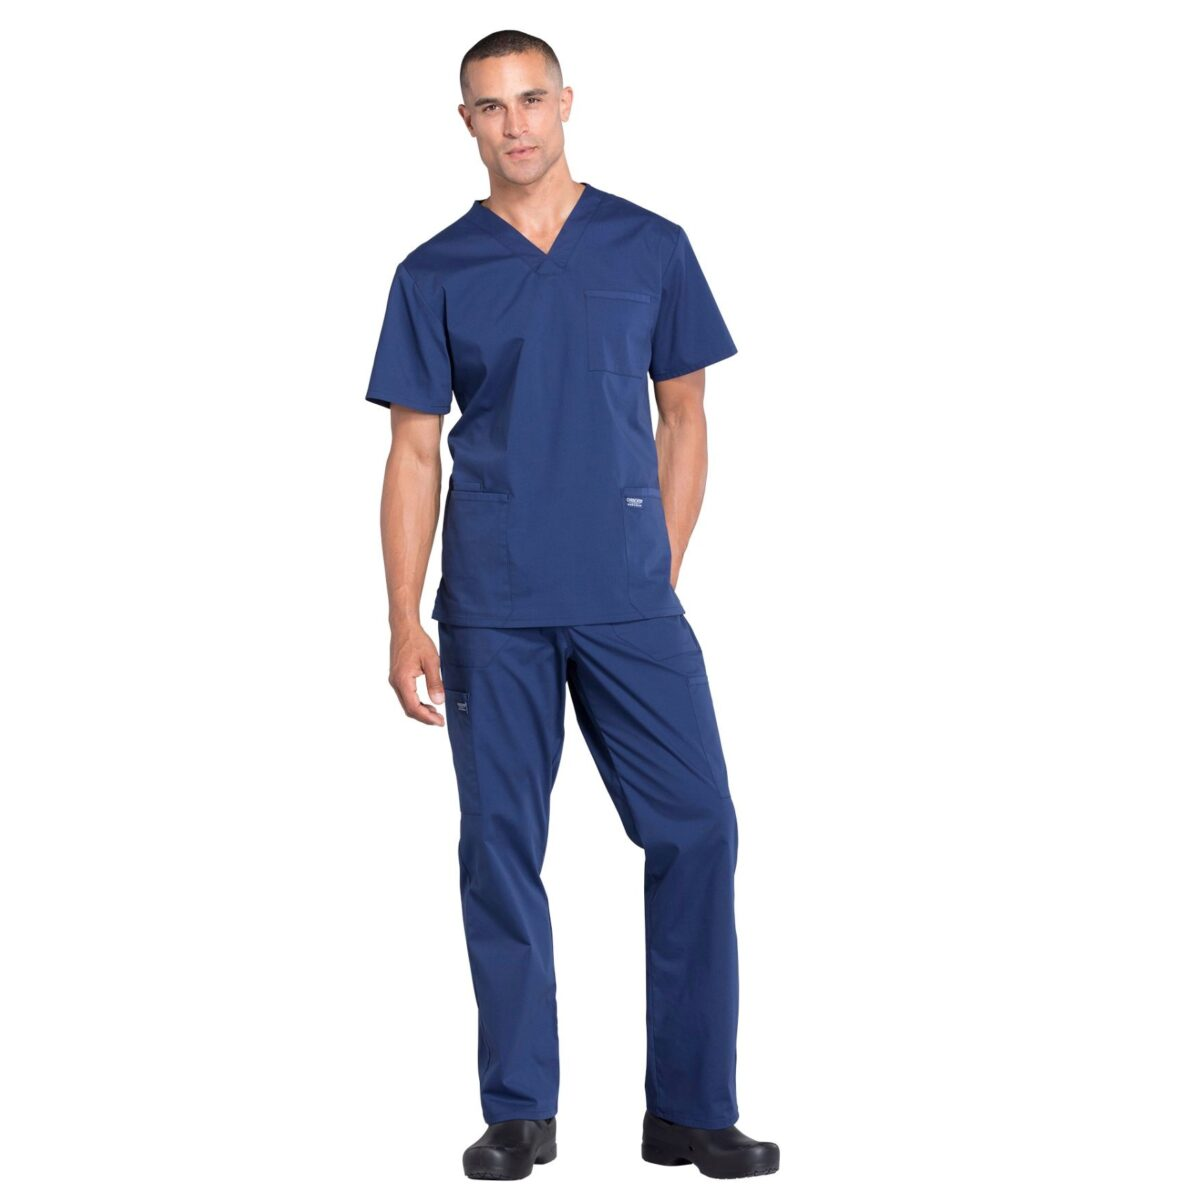 Мужской медицинский костюм Professionals цвет синий